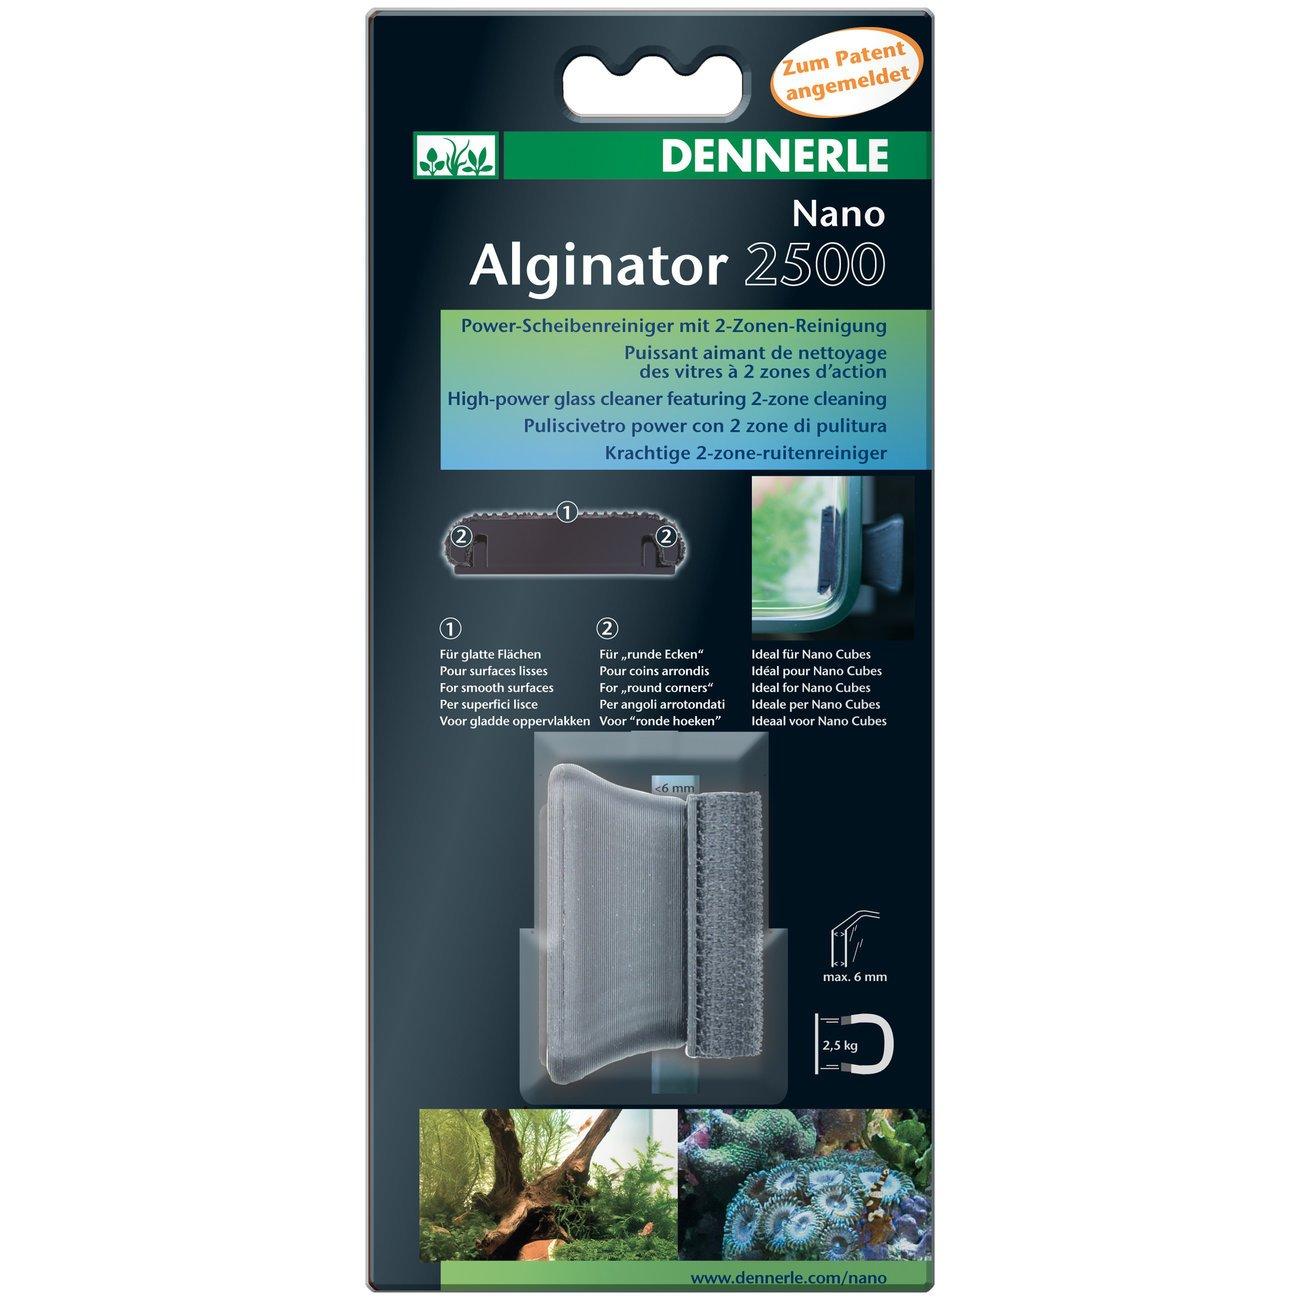 Dennerle Nano Alginator 2500, Algenmagnet